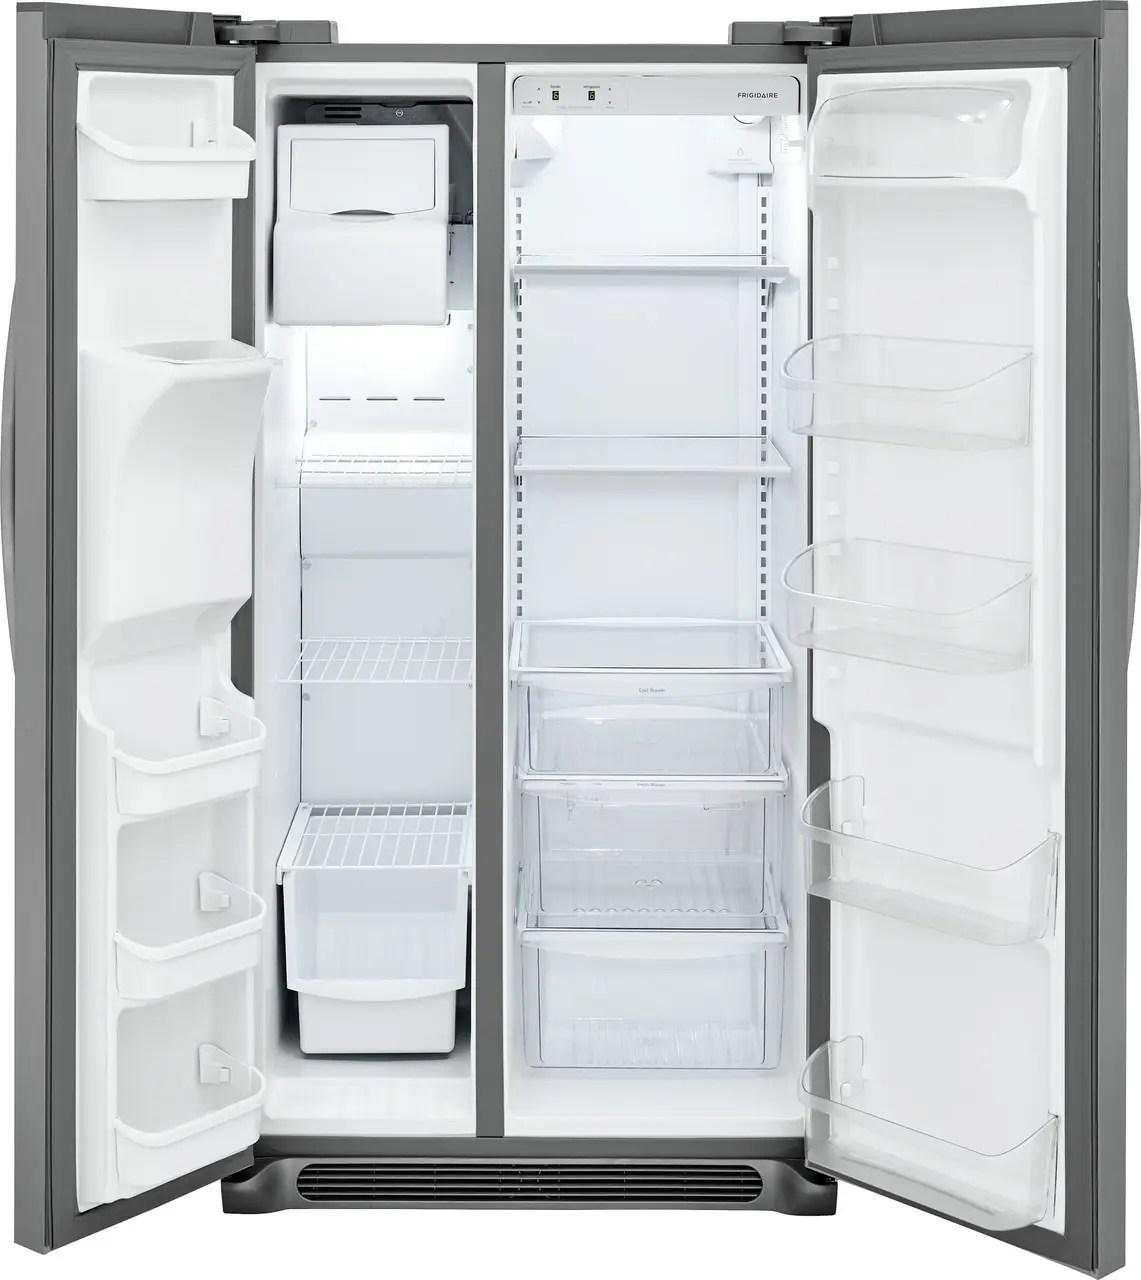 22.1 Cu. Ft. Side-by-Side Refrigerator Photo #2